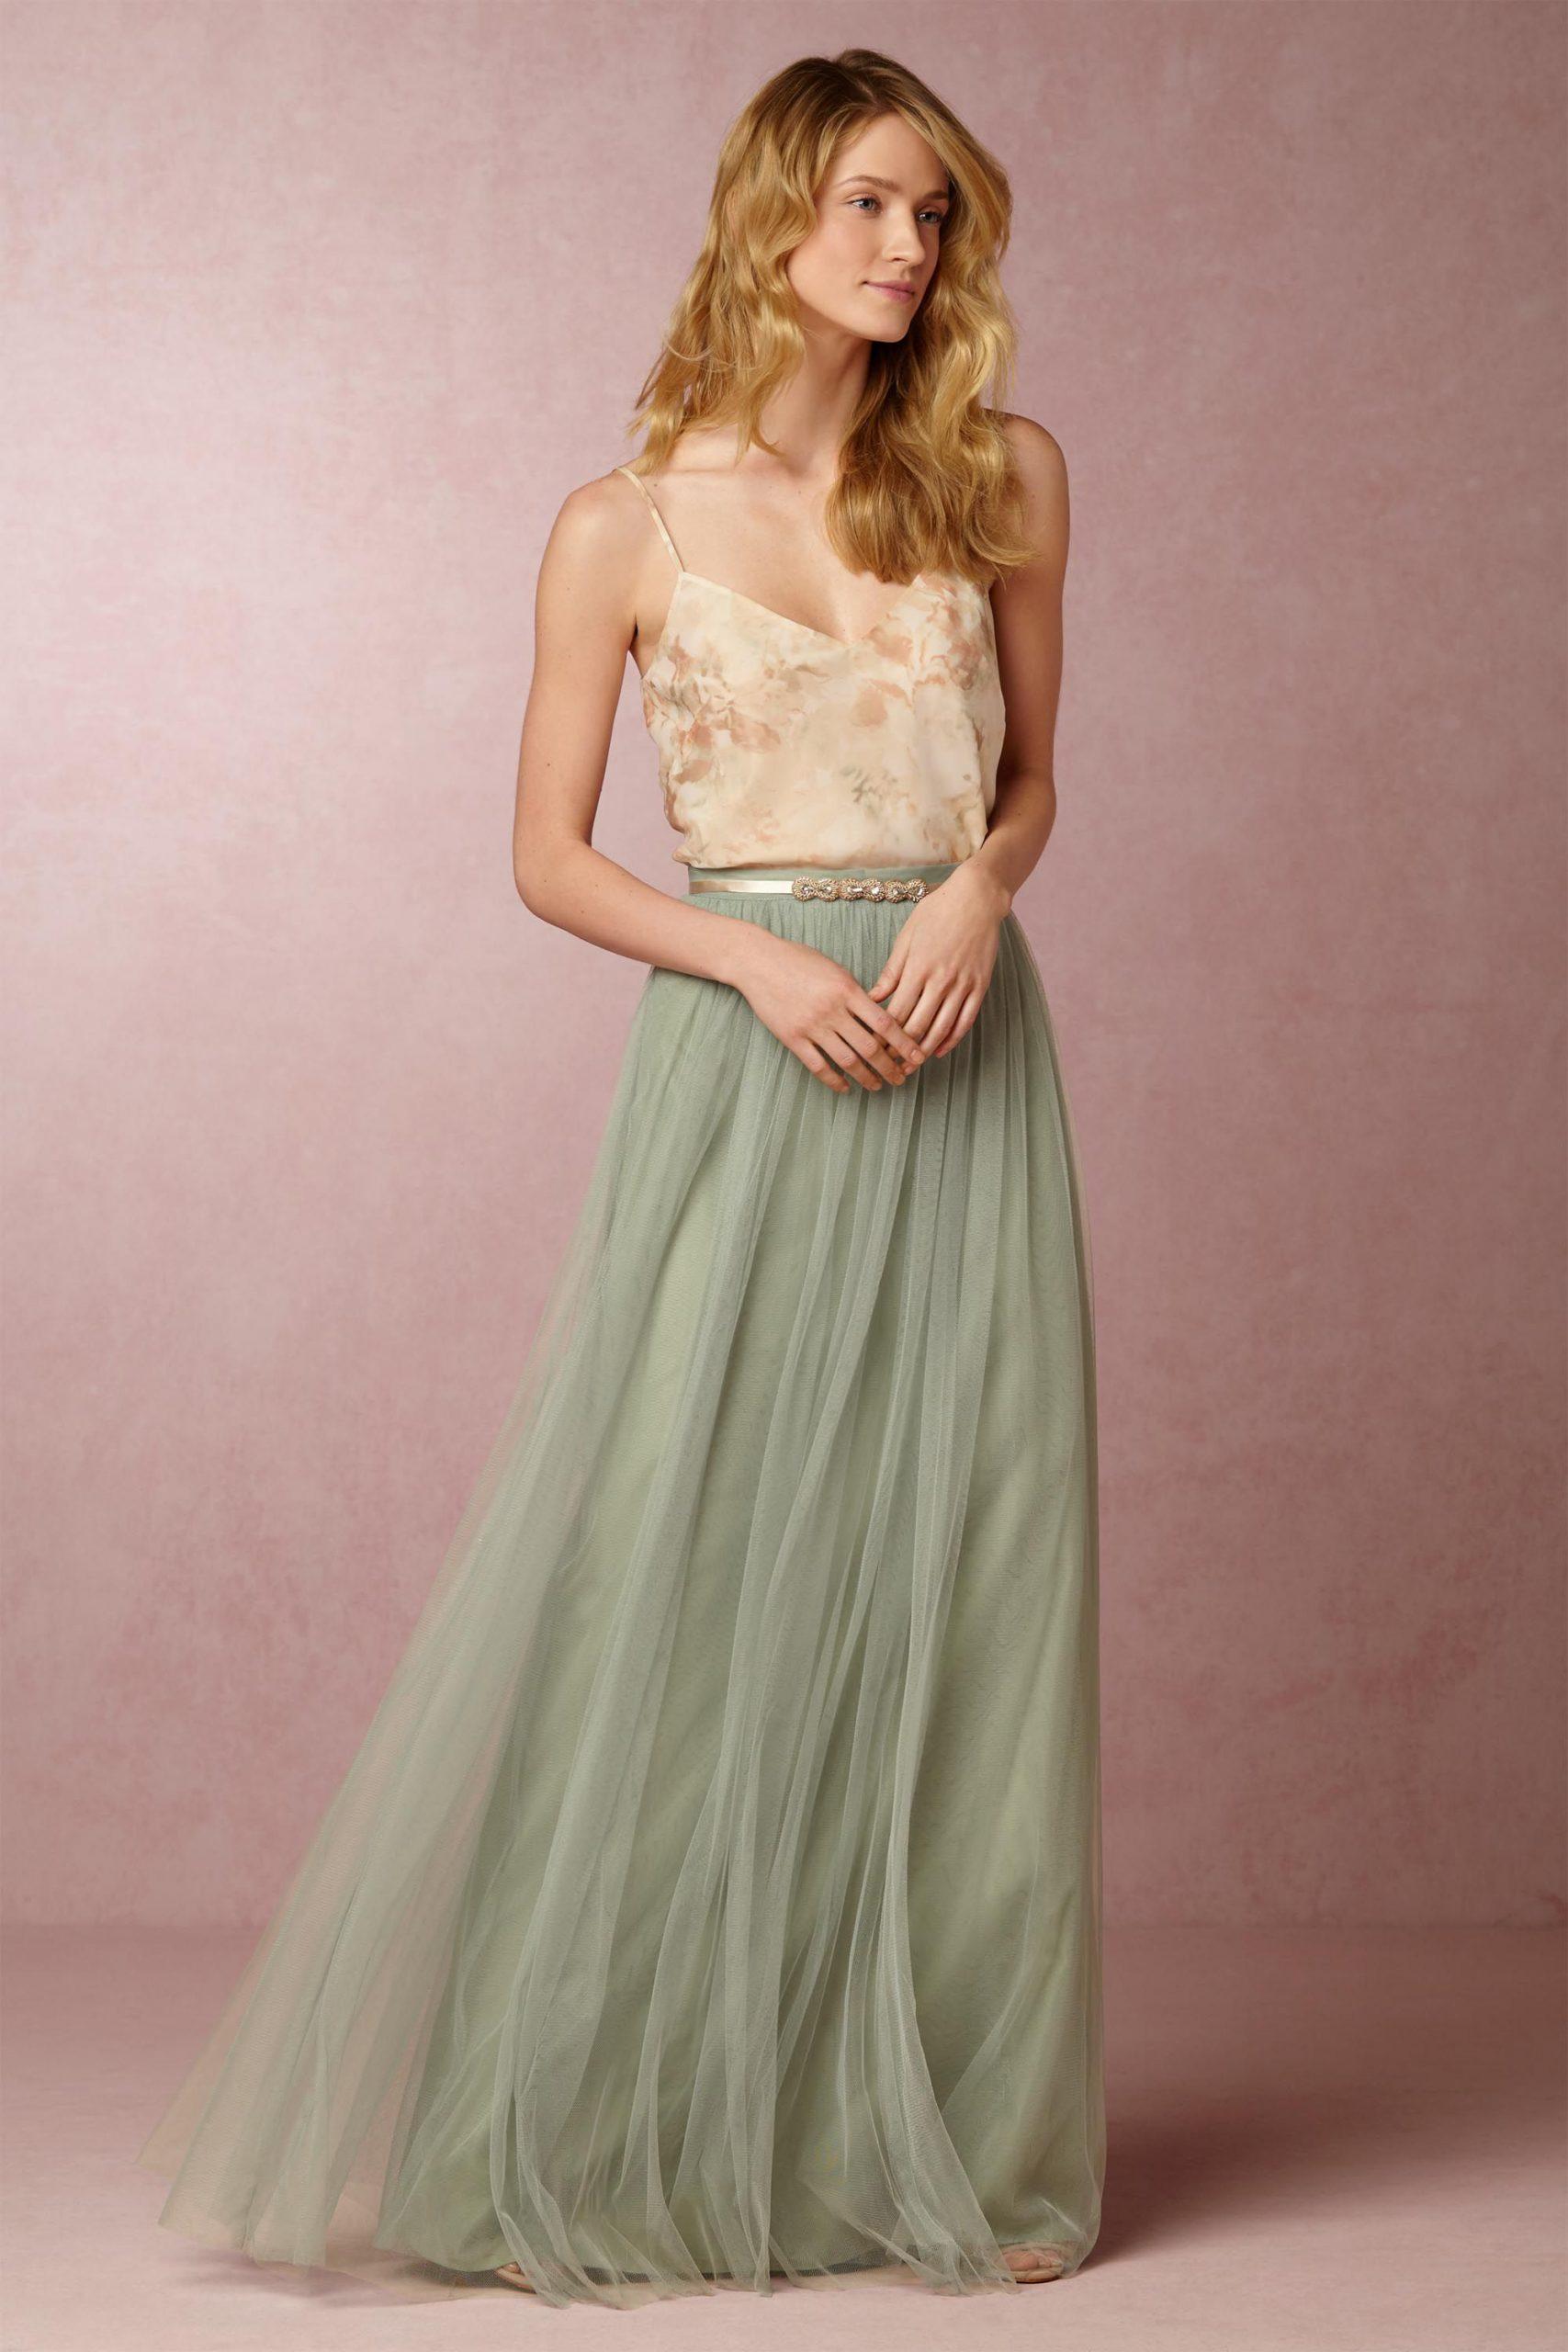 17 Coolste Boho Abendkleid Galerie Einzigartig Boho Abendkleid Design